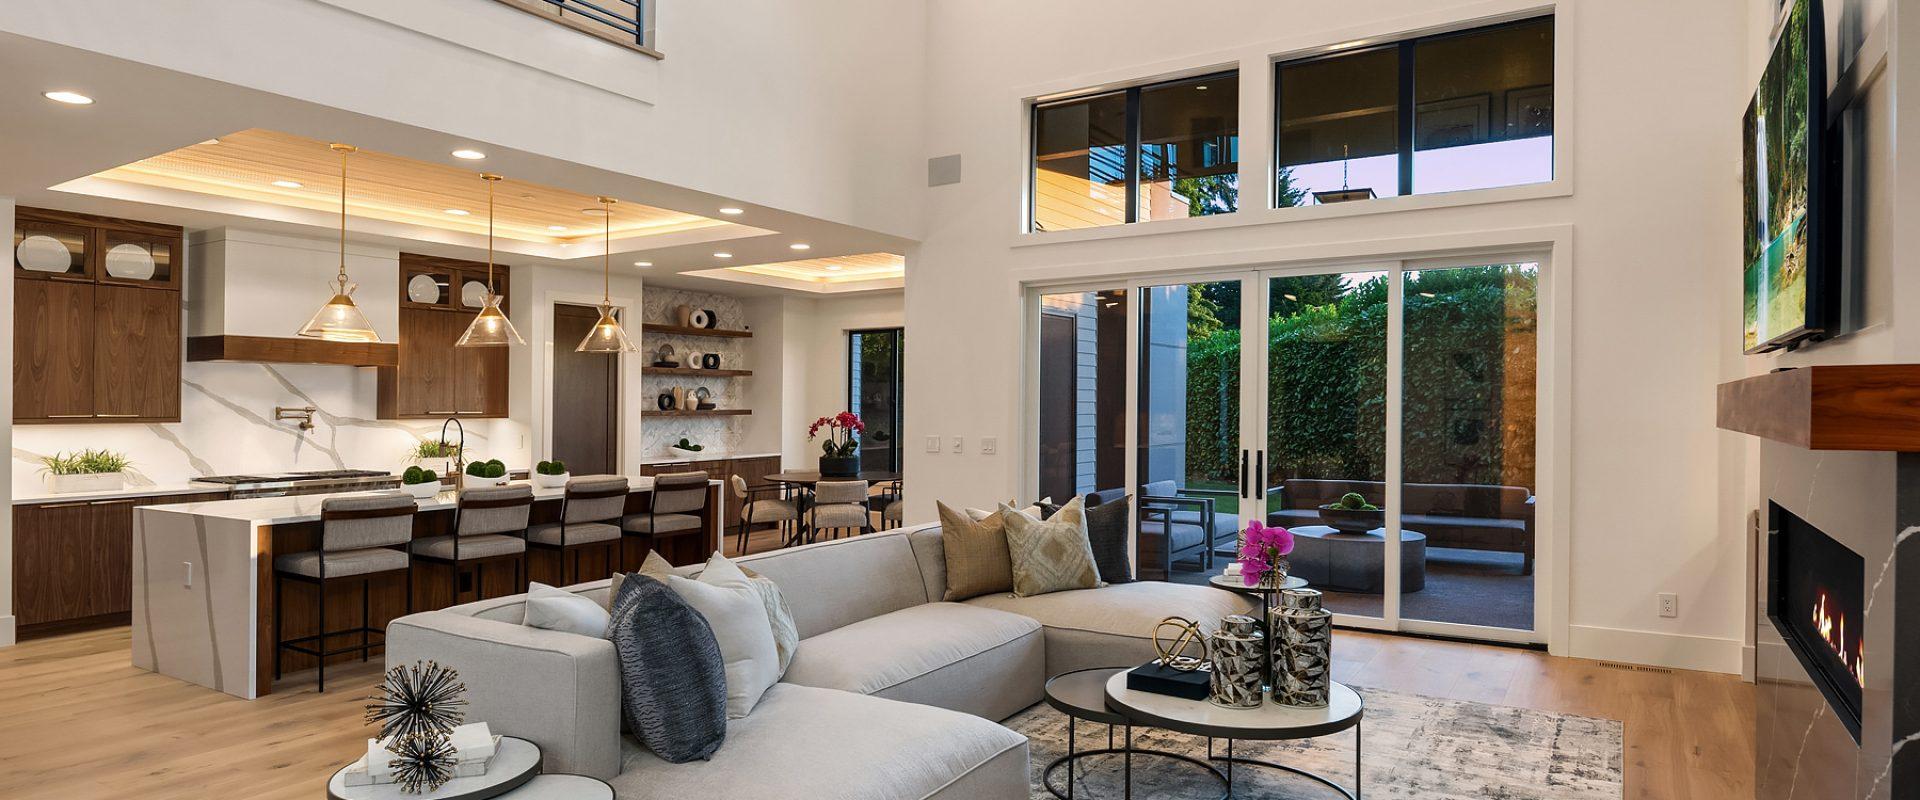 212-9-2659 90th Ave NE-bellevue-wa-mn-custom-homes-greatroom